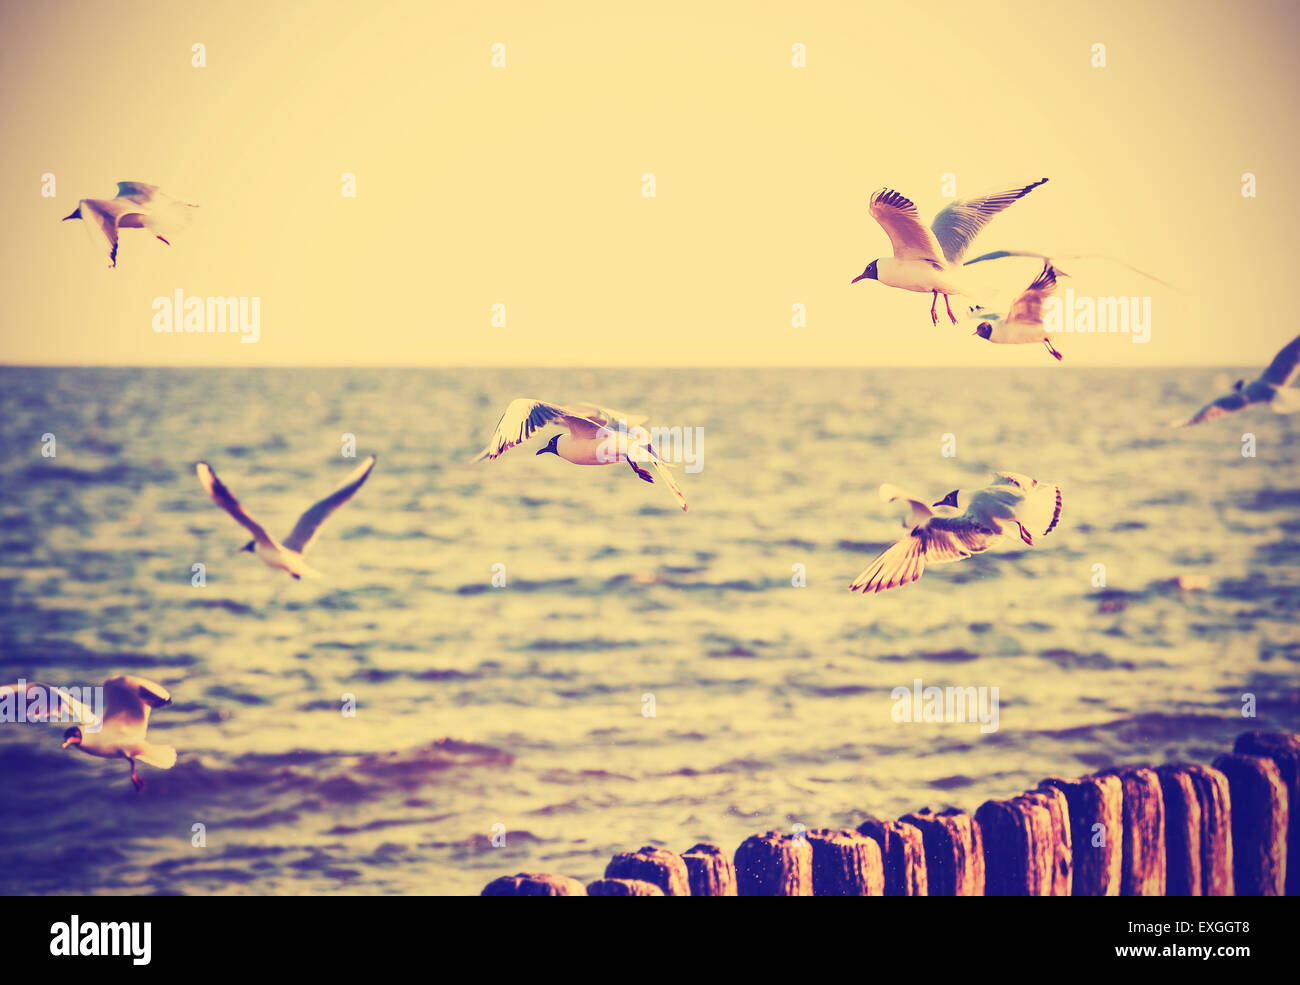 Vintage Retro gefiltert Vögel am Meer, Natur Hintergrund, alte Film-Effekt. Stockbild